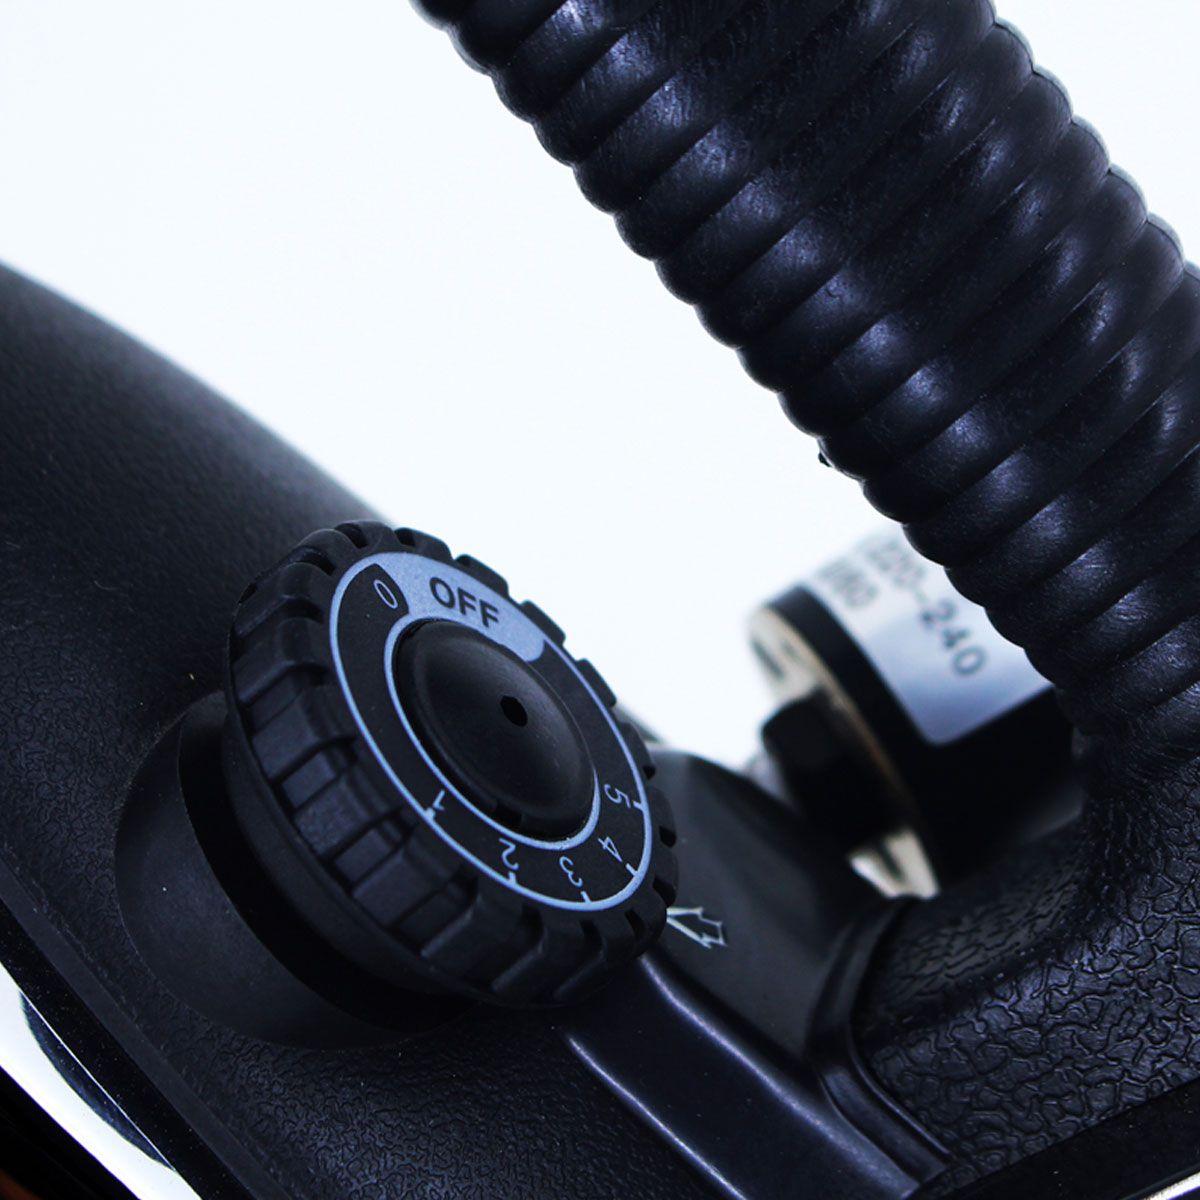 Ferro Industrial Passar Roupas A Vapor 3,5 Litros 1000 Watts + Sapata Anti-Brilho